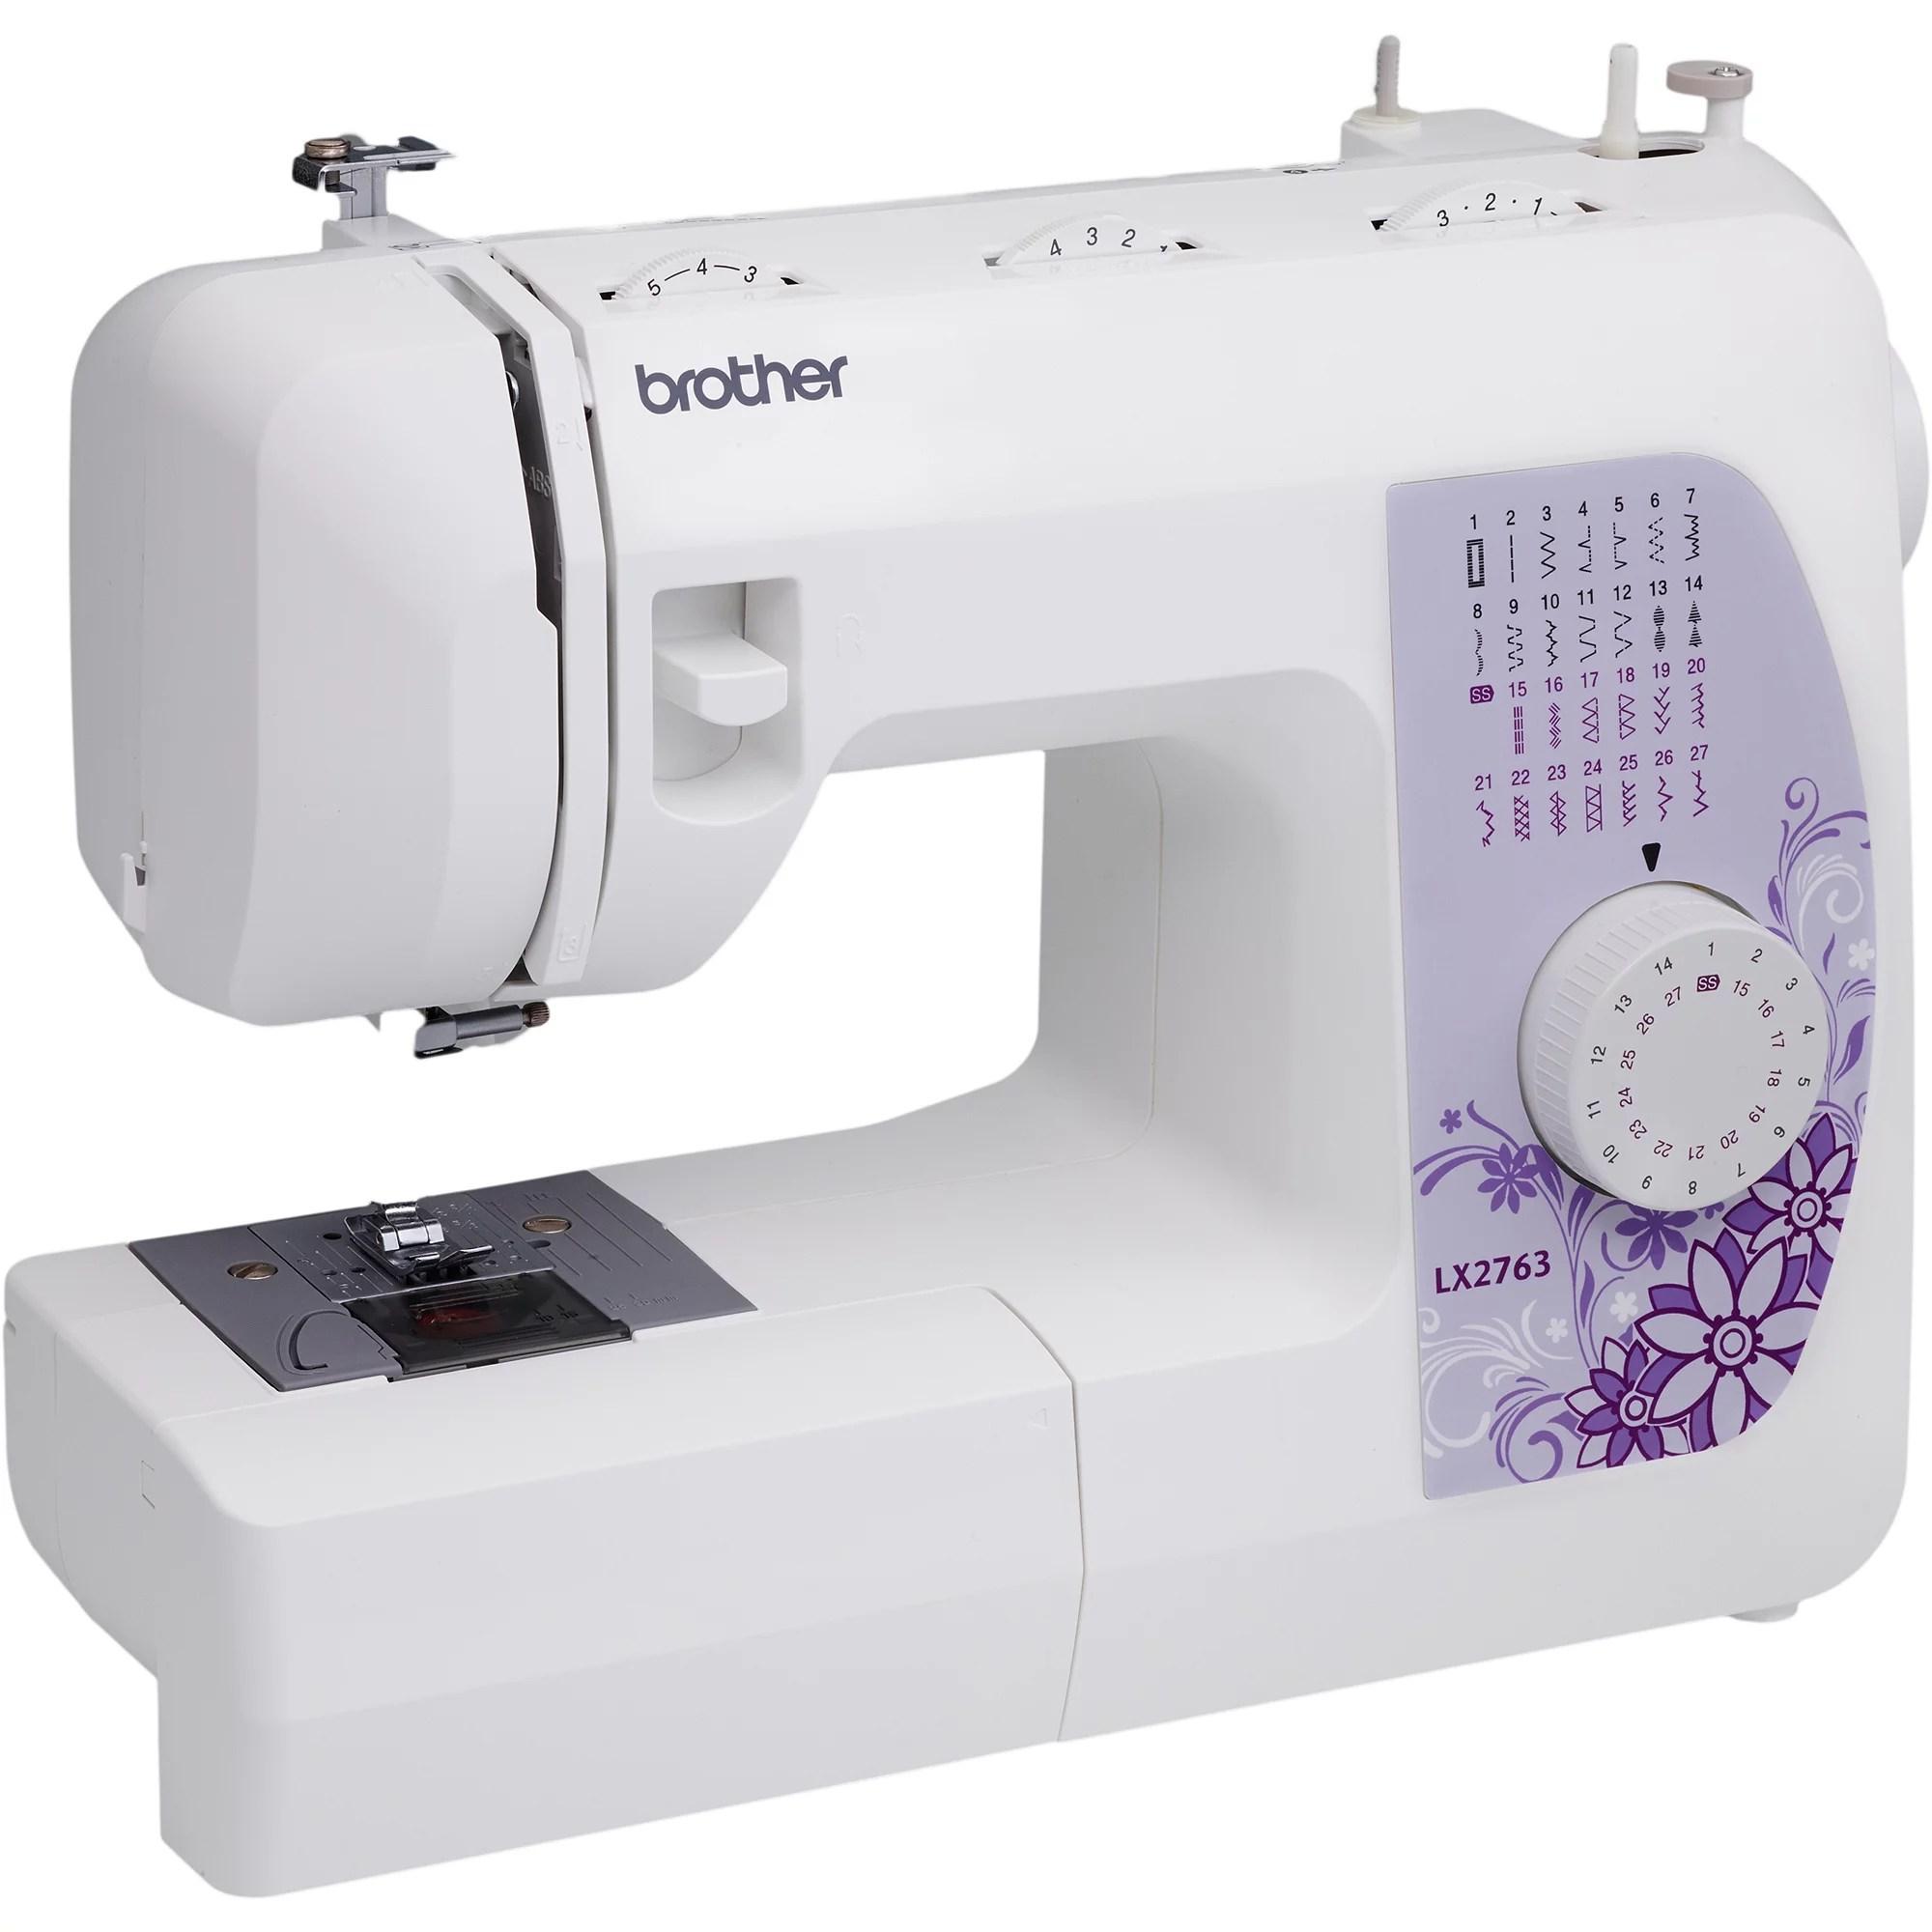 Brother 27Stitch Sewing Machine Drop In Bobbin Portable